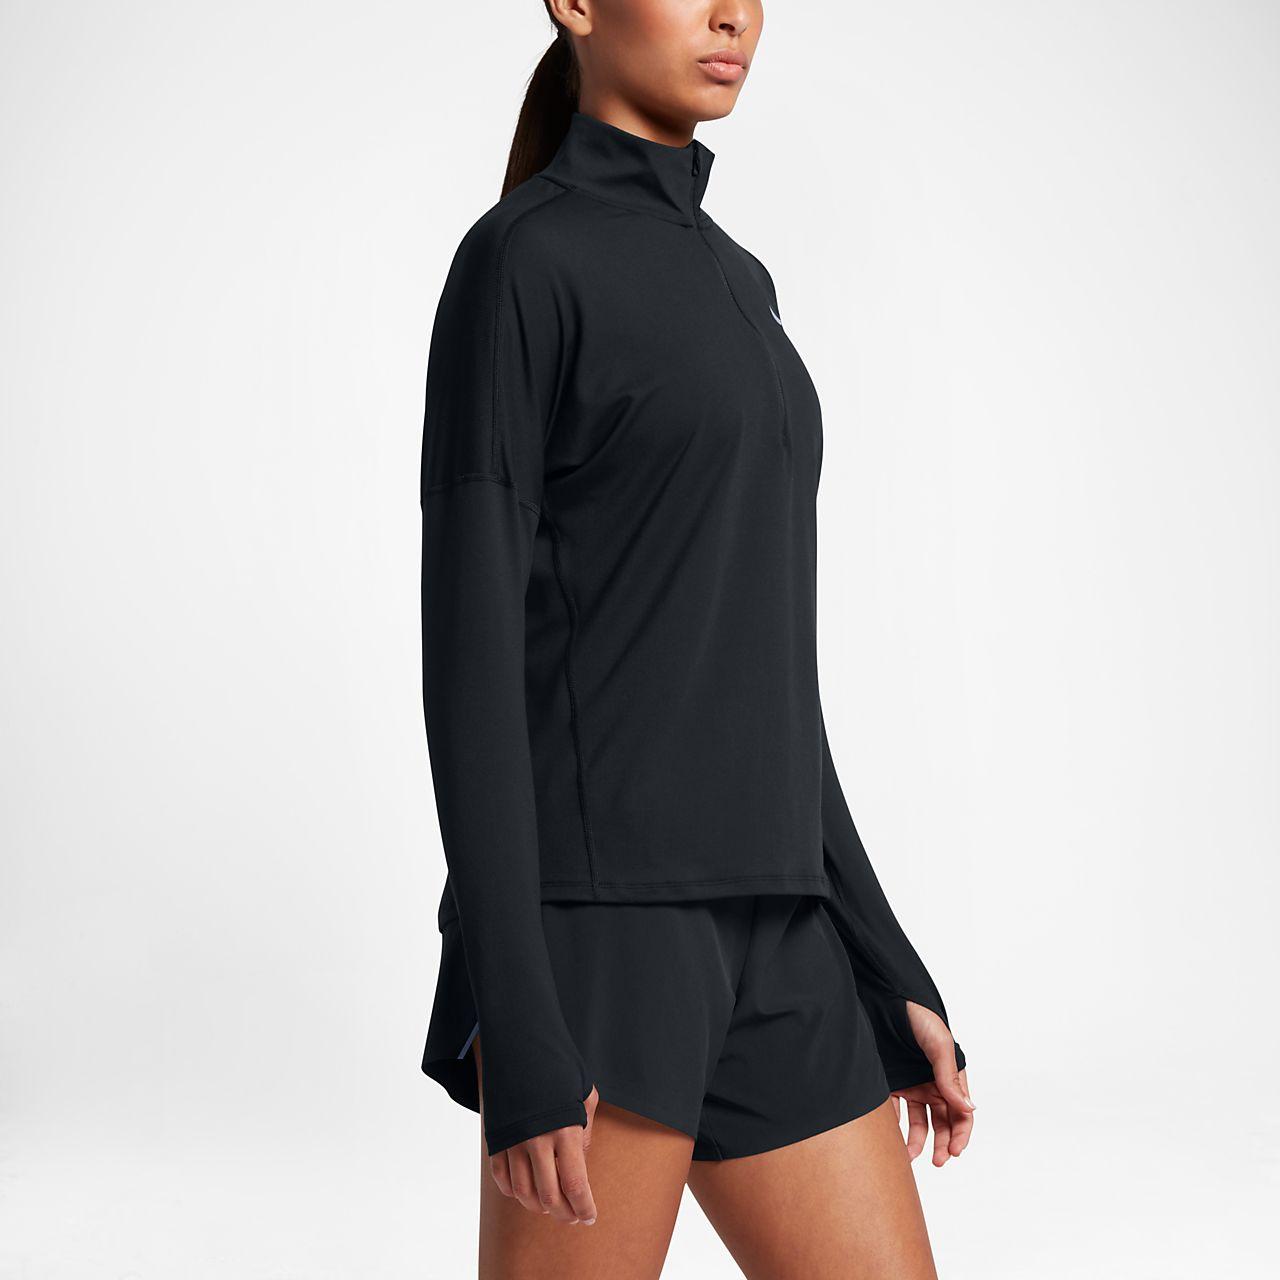 2c31c944a72b42 Nike Dri-FIT Women s Long-Sleeve Running Half-Zip Top. Nike.com GB